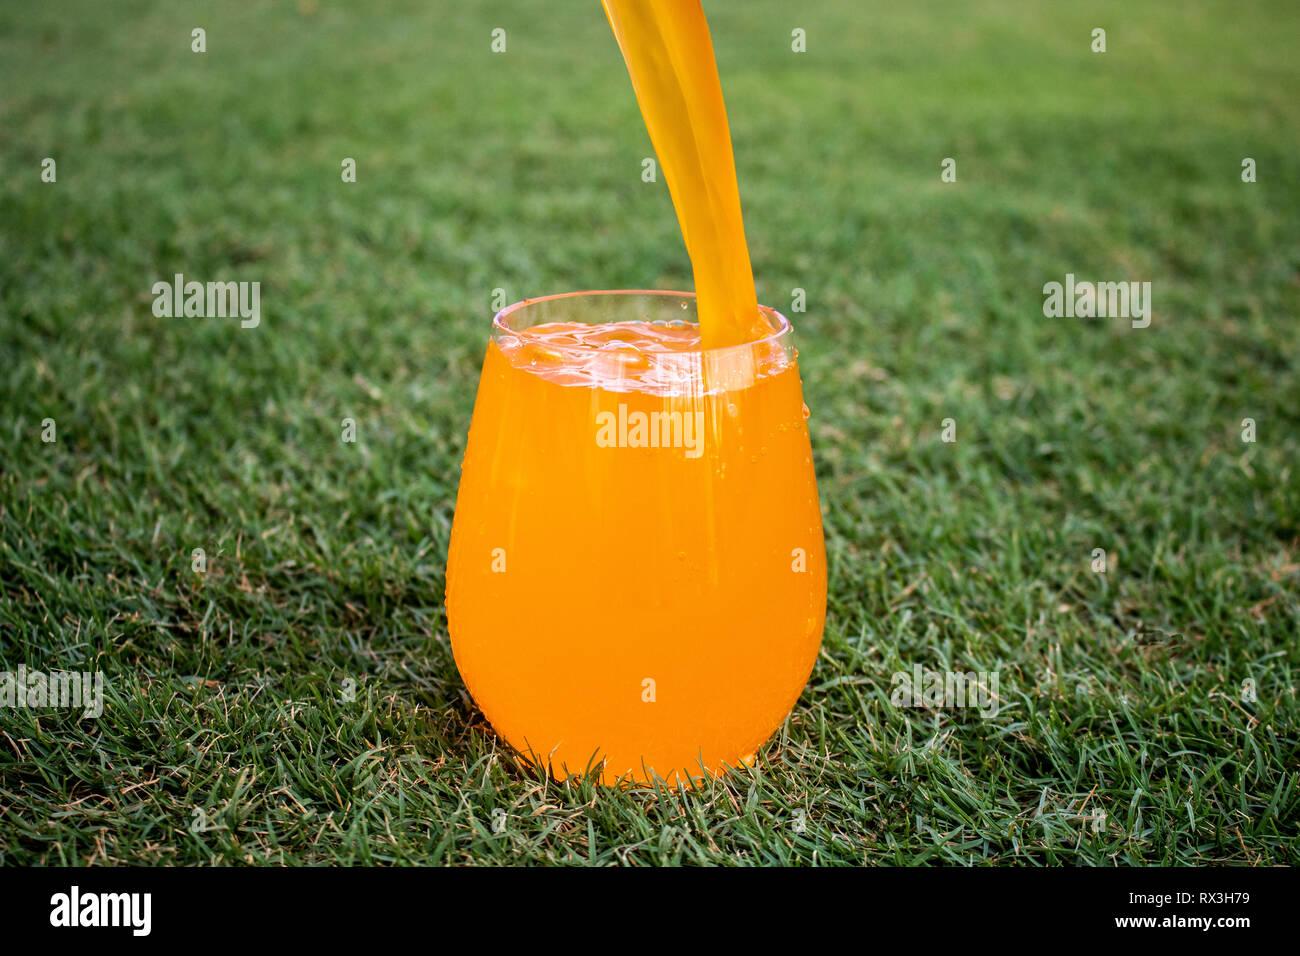 liquid pour - Stock Image